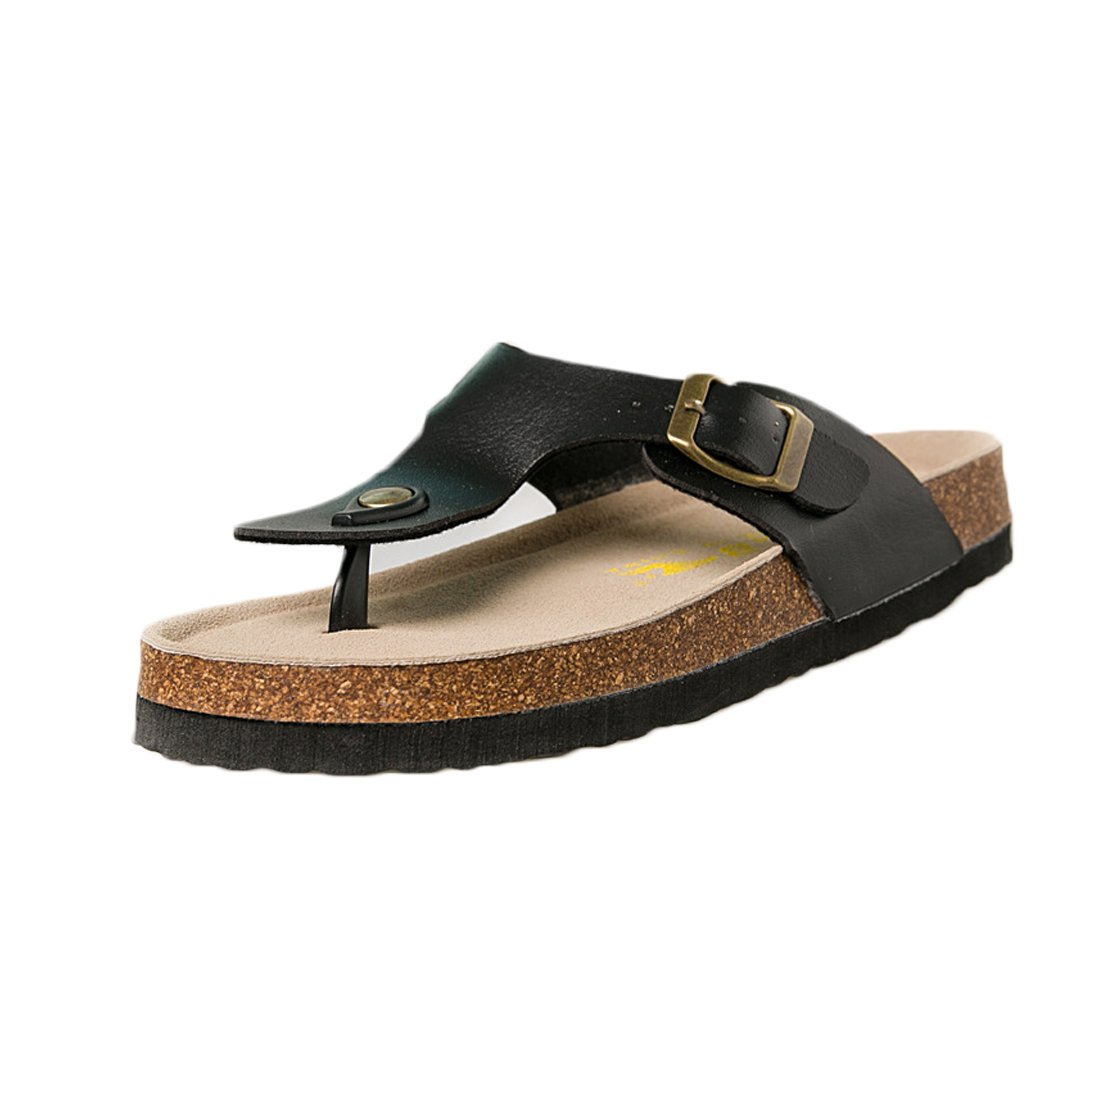 Rockynice Women's Glitter Casual Buckle Thong Slip-On Chunky Platform Wedge Sandal Beach Slides Plus Size B07BC63PLQ 36 M EU|Black